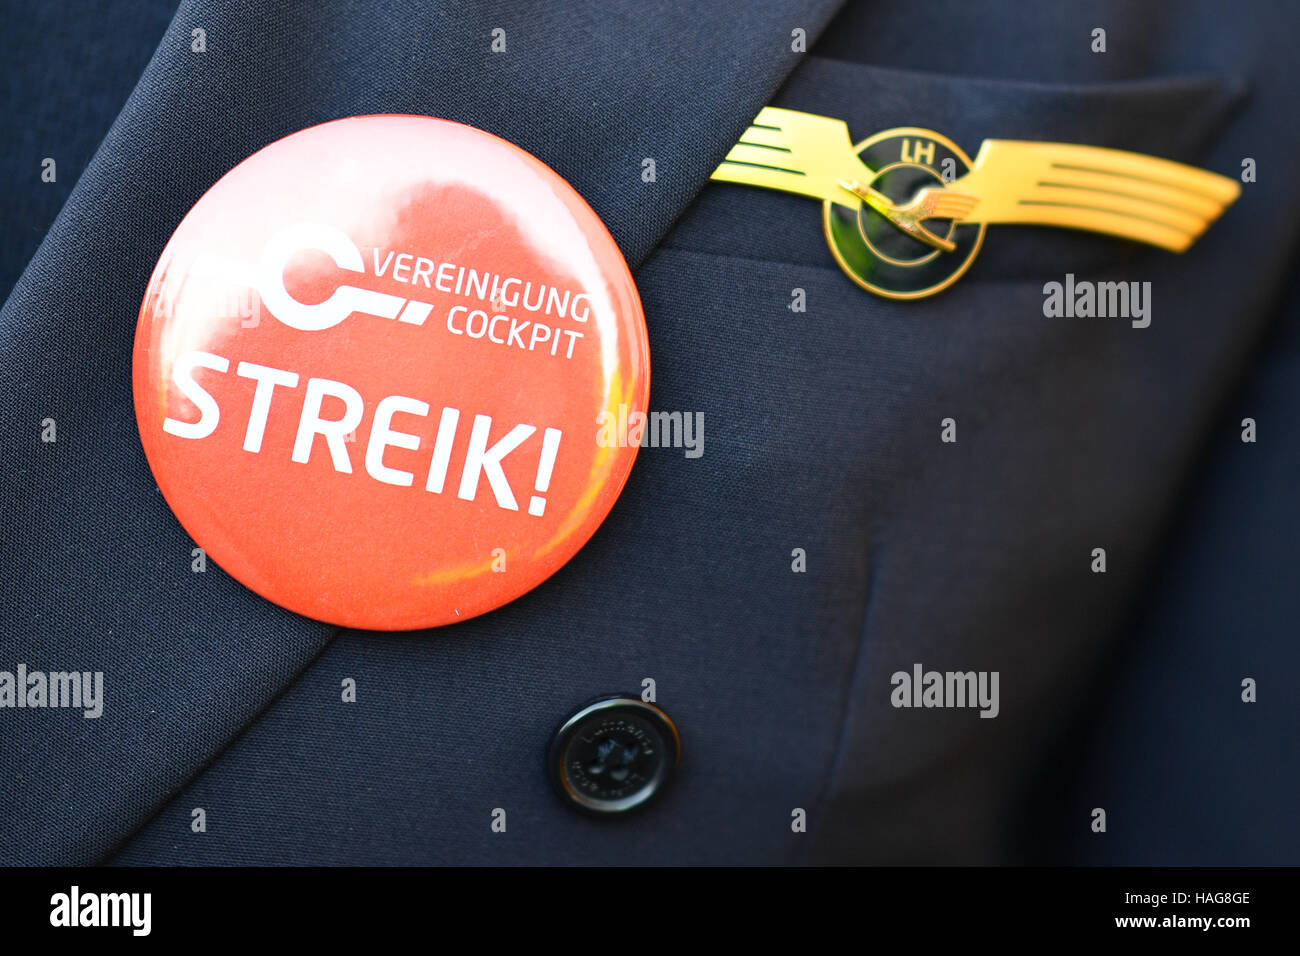 Frankfurt, Germany. 30th November, 2016. A Lufthansa pilot wearing a badge that says 'Streik!' (strike!) - Stock Image